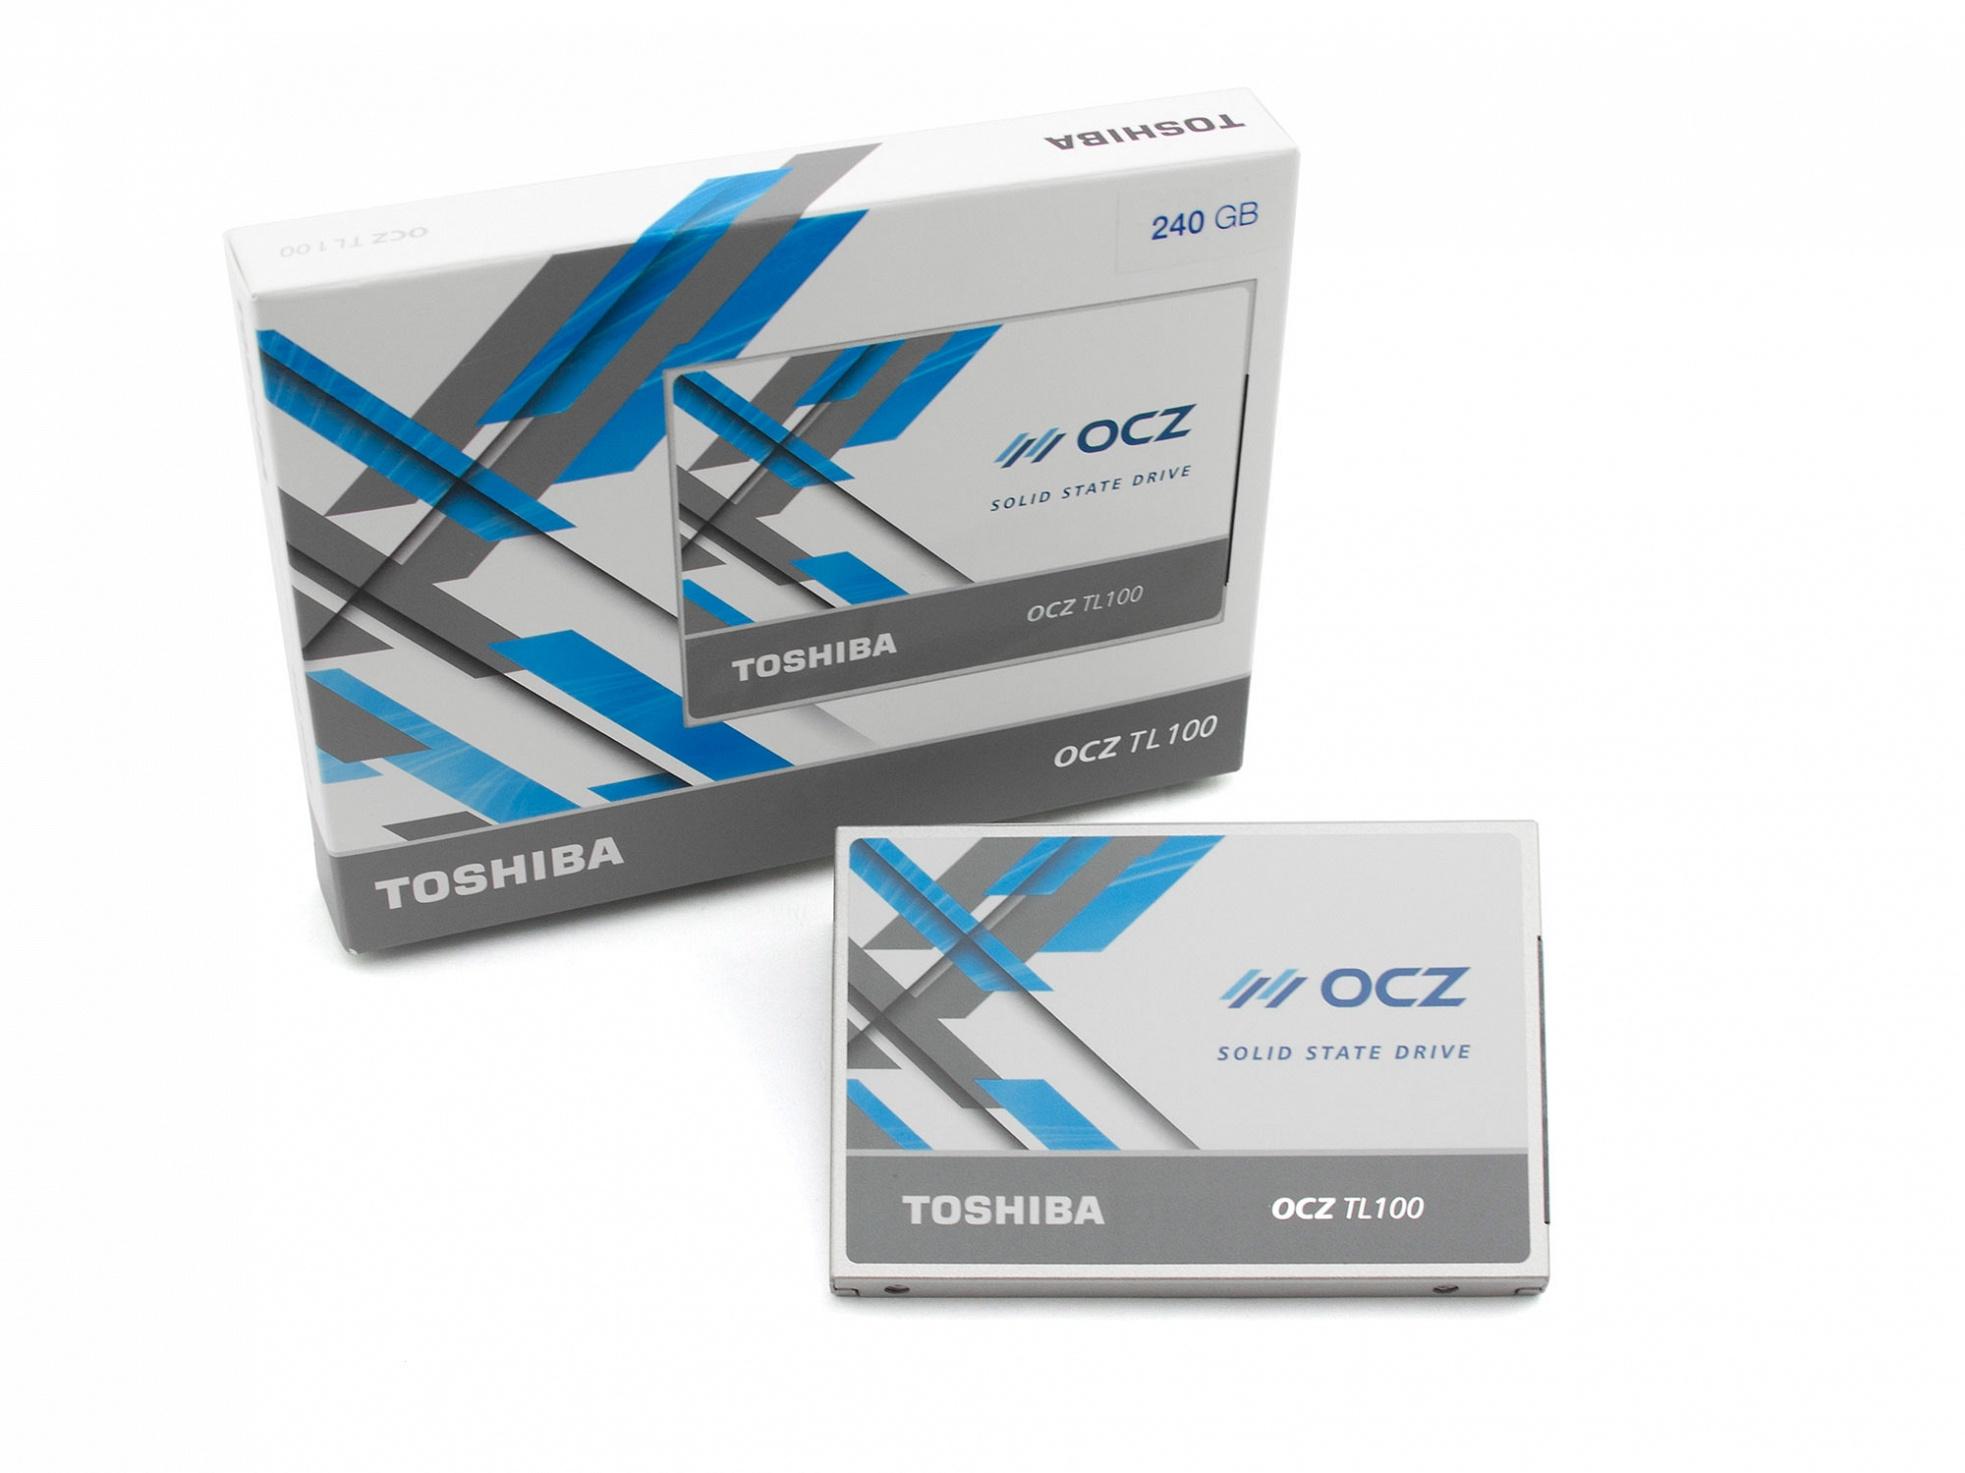 Festplatte SSD - 240GB OCZ TL100 für Wortmann Terra Mobile 1509 (1220111)